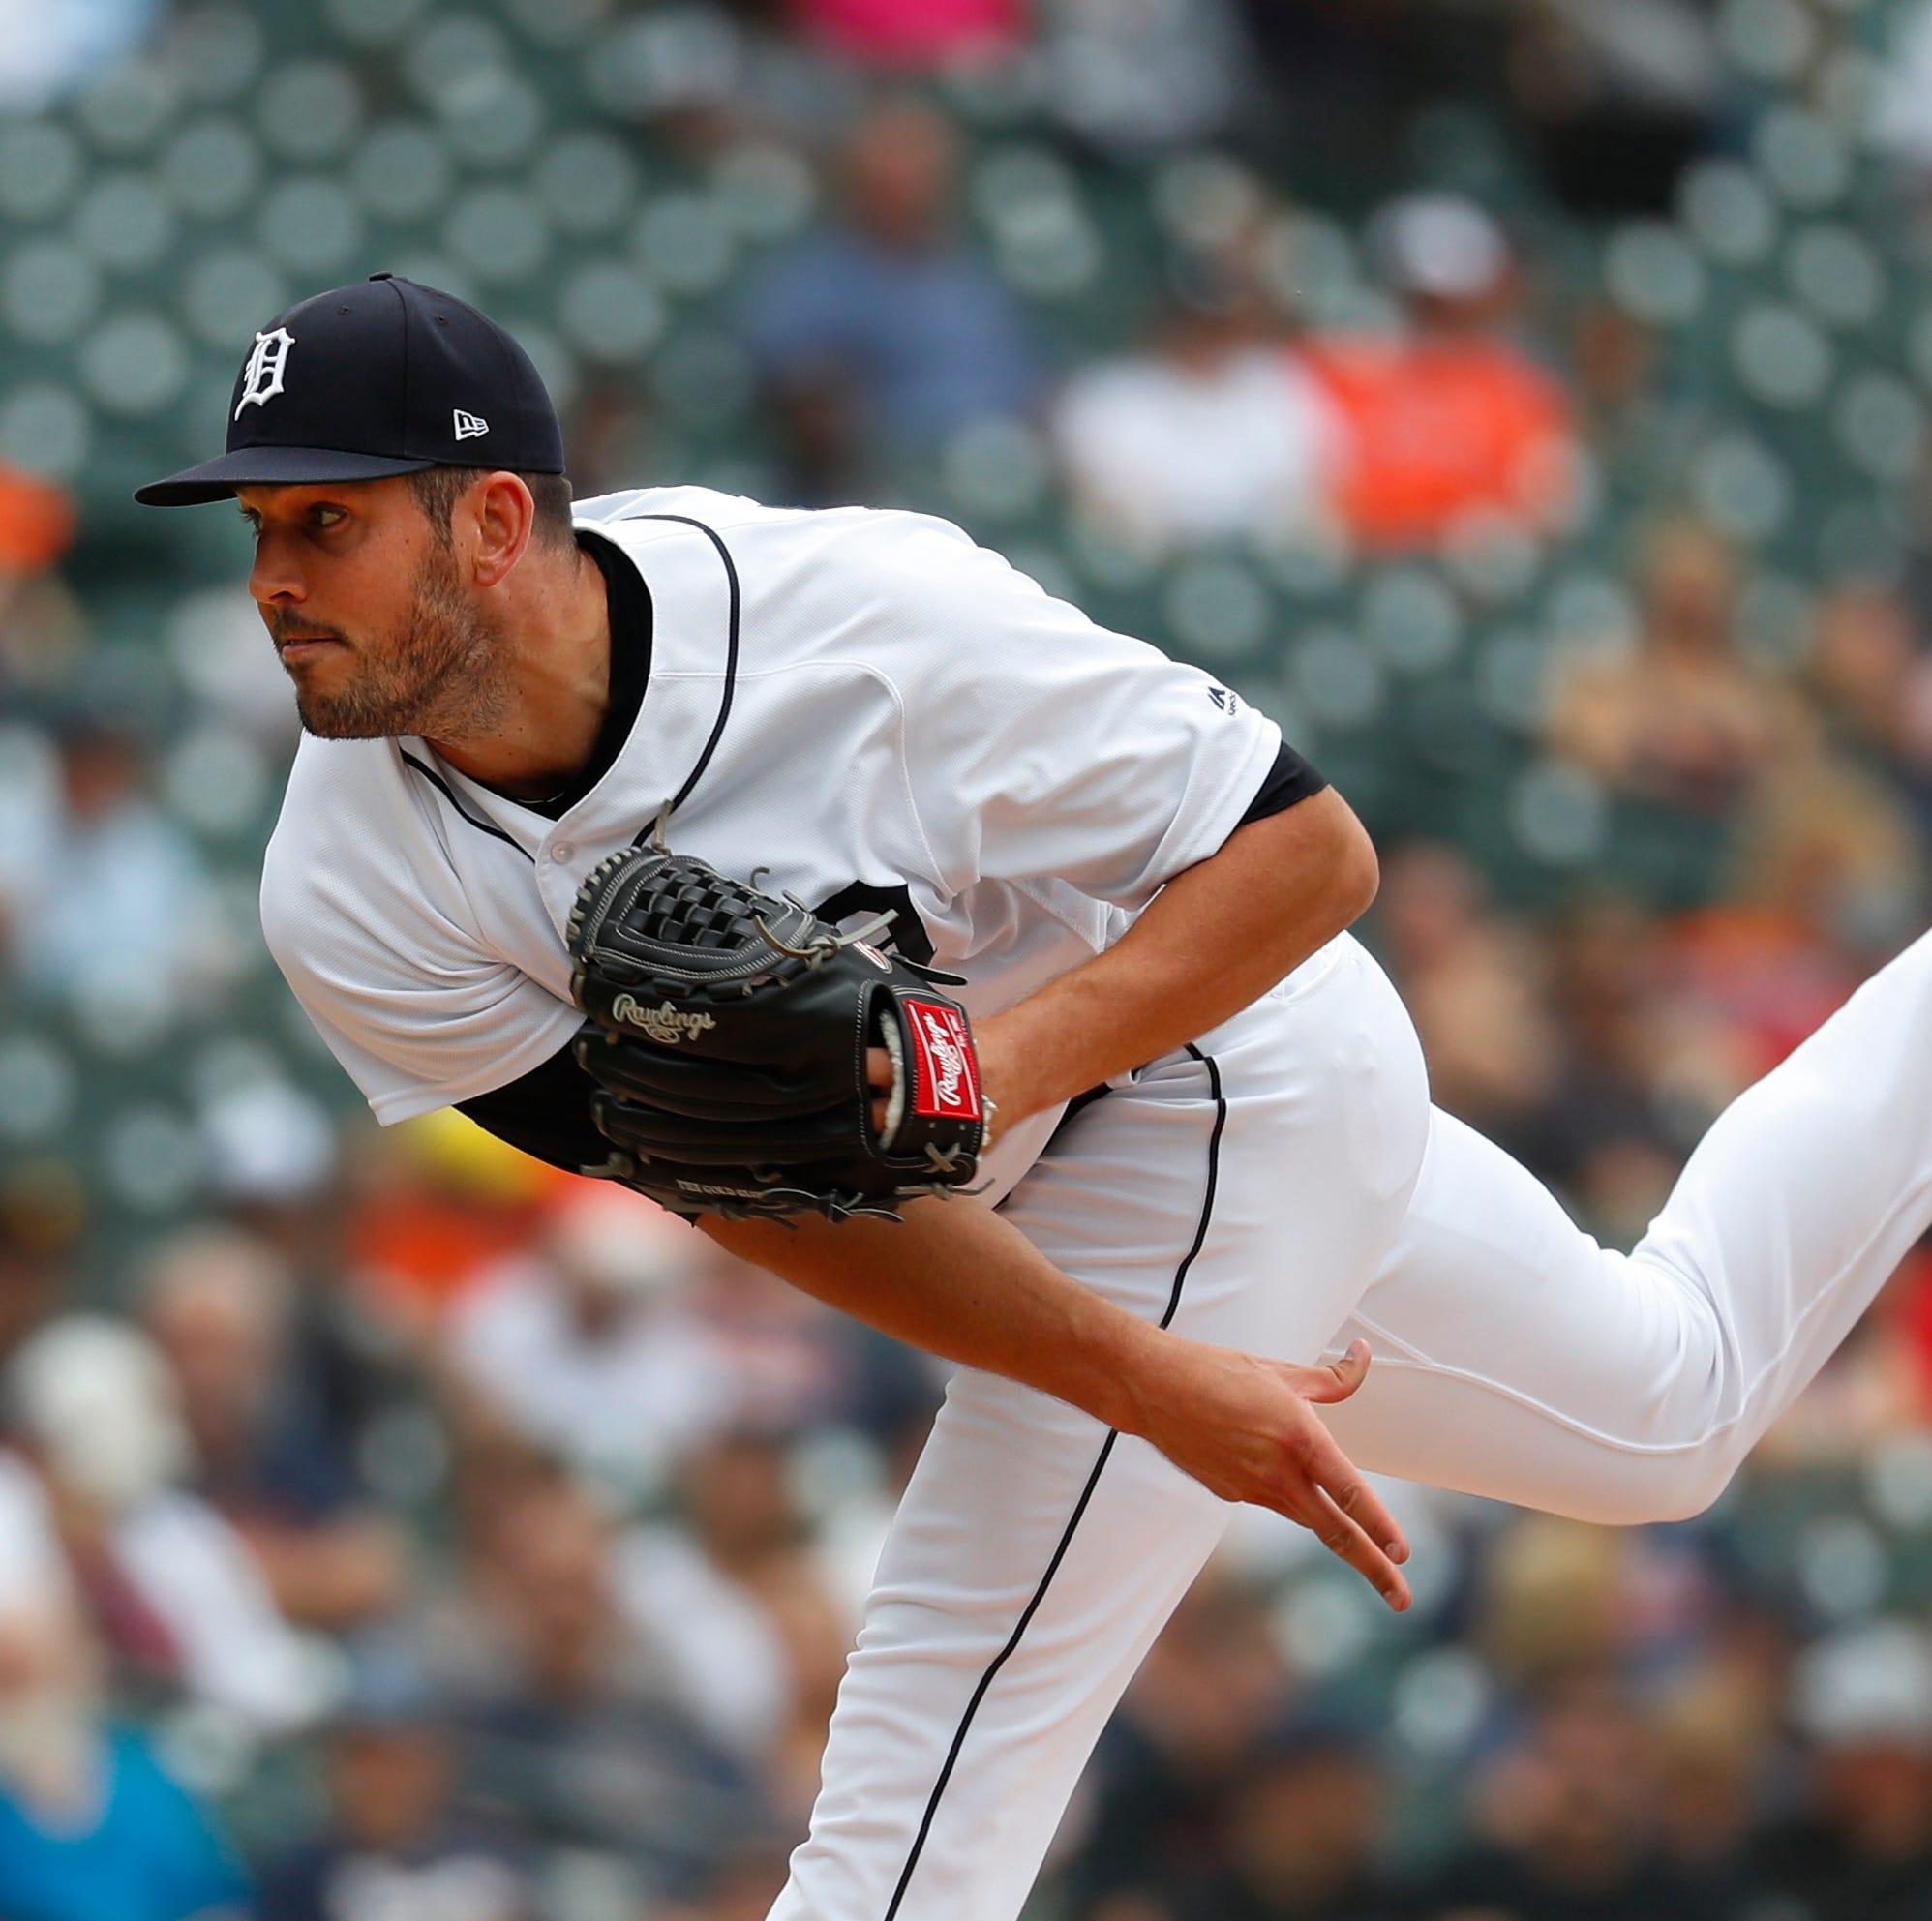 A man in control: Tigers' Drew VerHagen finally finds key to unlock vast potential